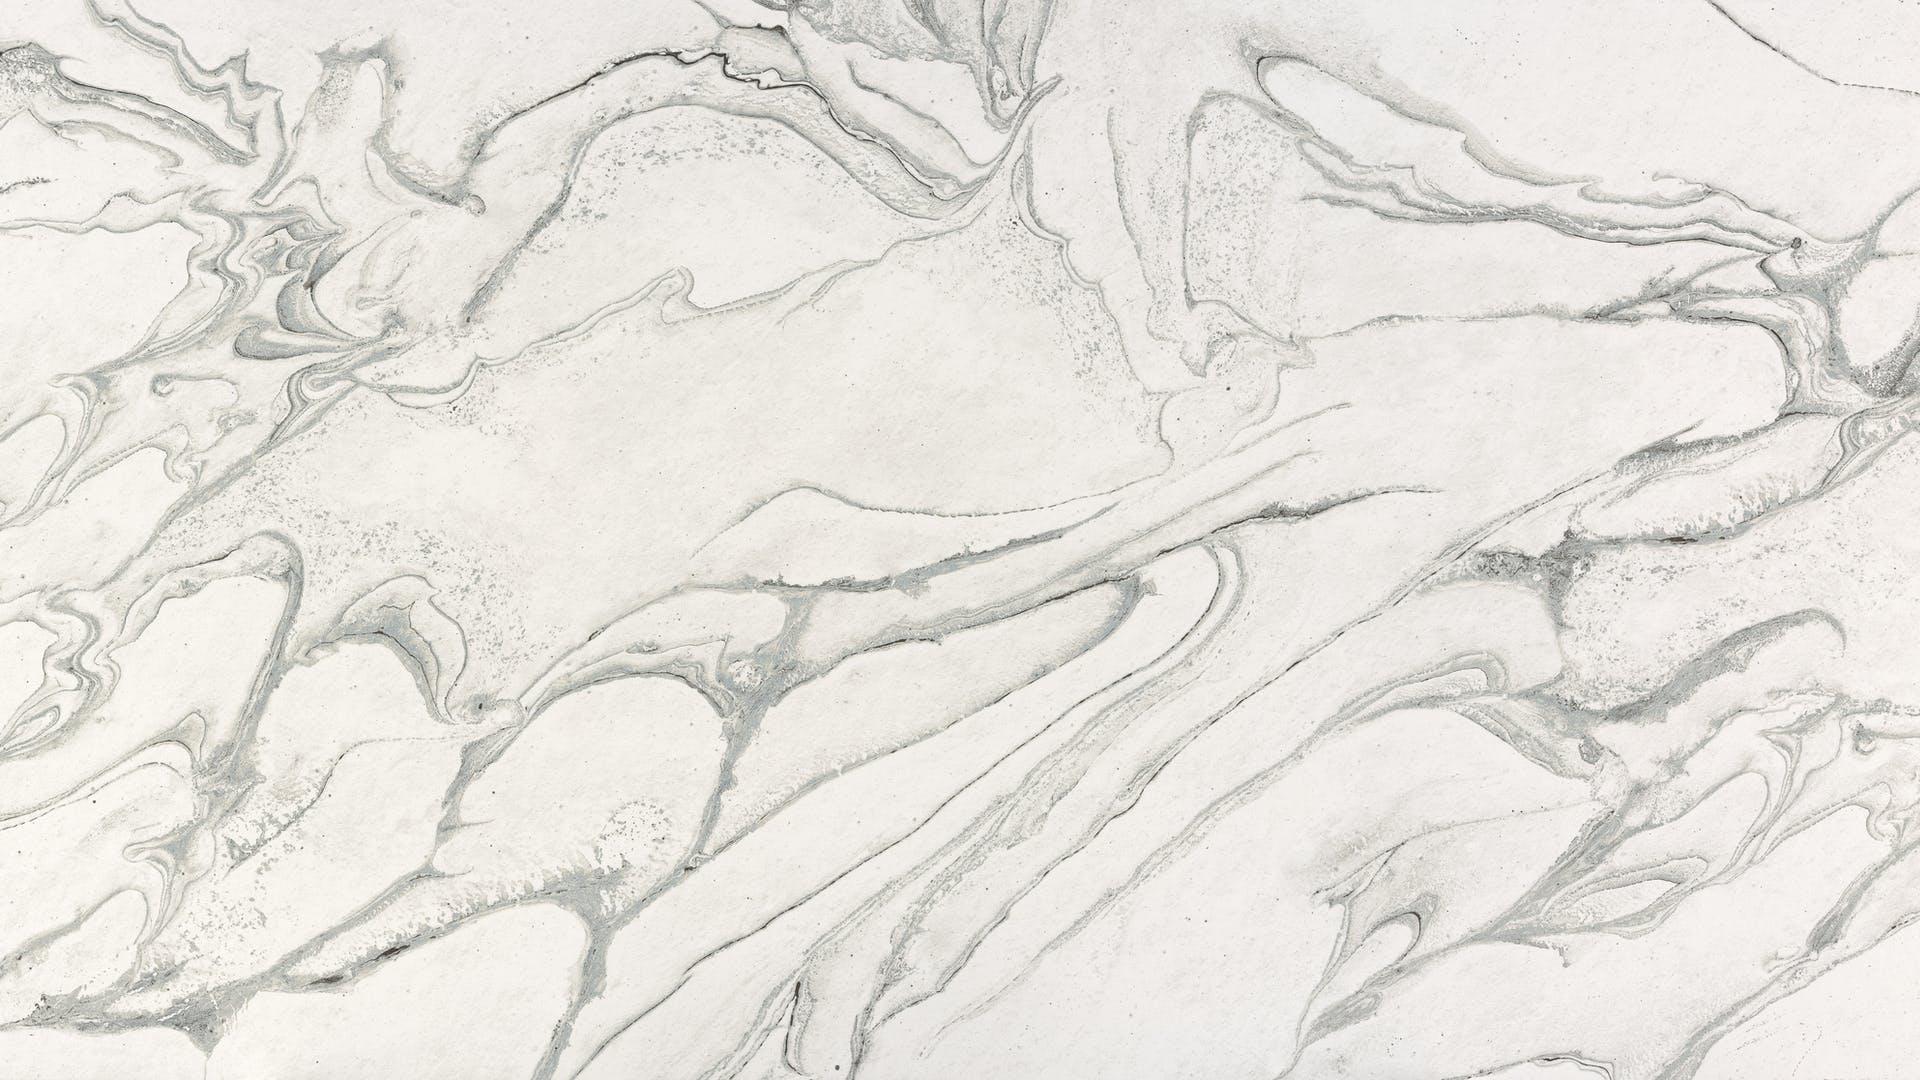 Placa de Porcelana Dekton Sky Pulido Xgloss-Stonika Collection